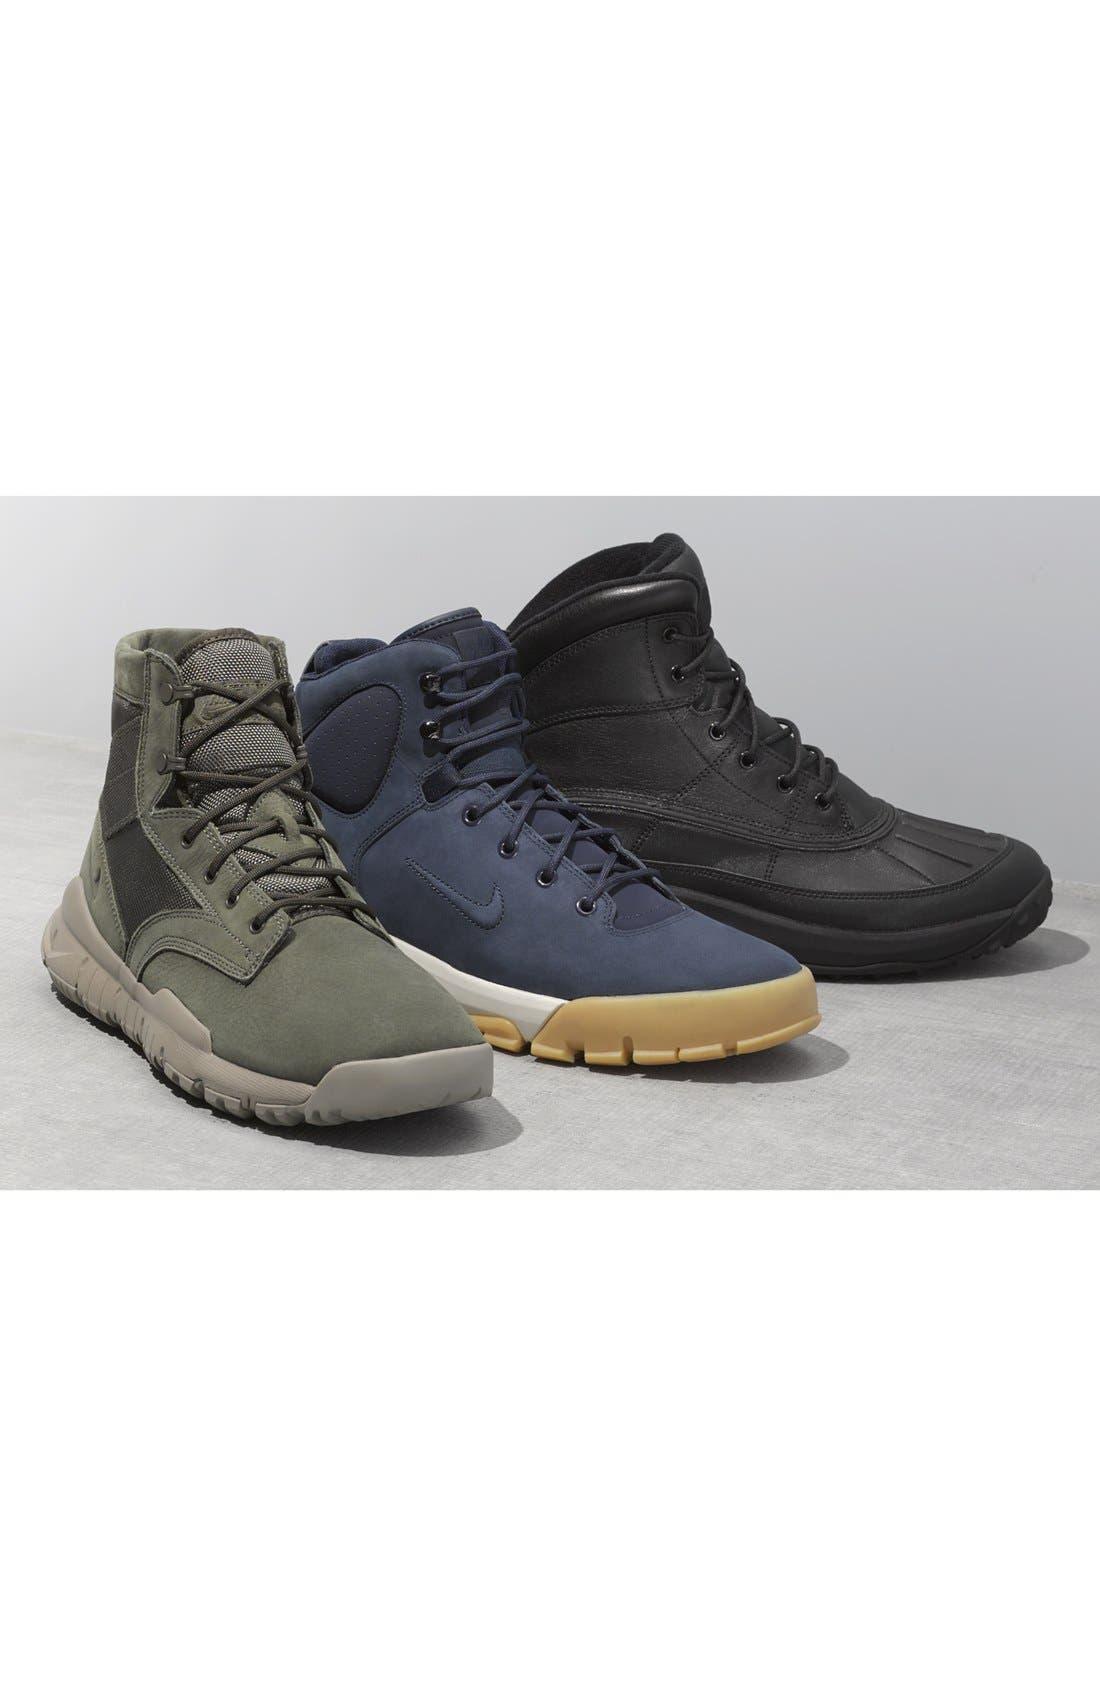 NIKE 'Kynwood' Boot, Main, color, 200